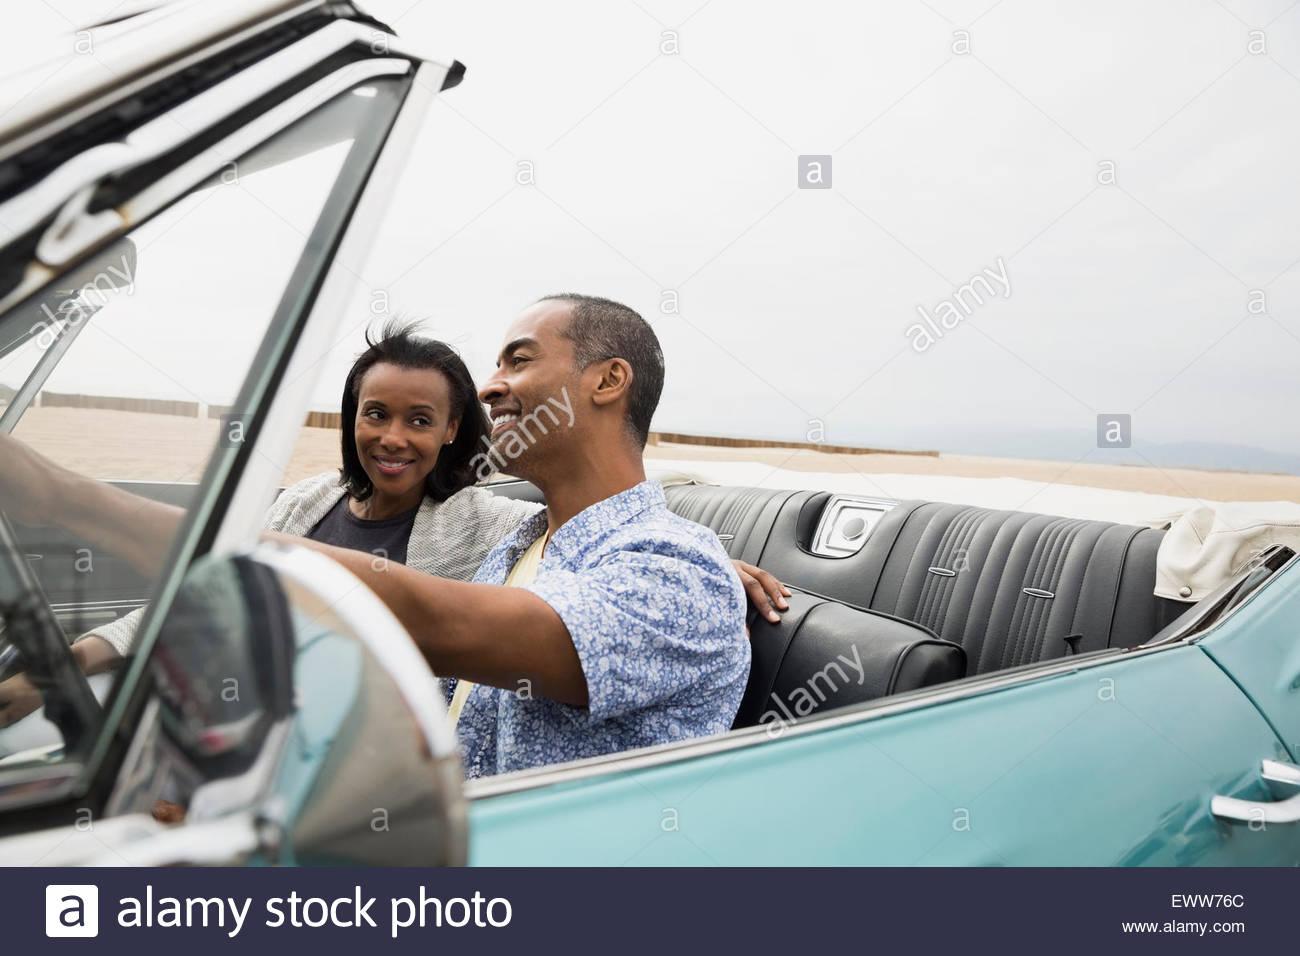 Paar im Cabrio Strand entlang reiten Stockbild